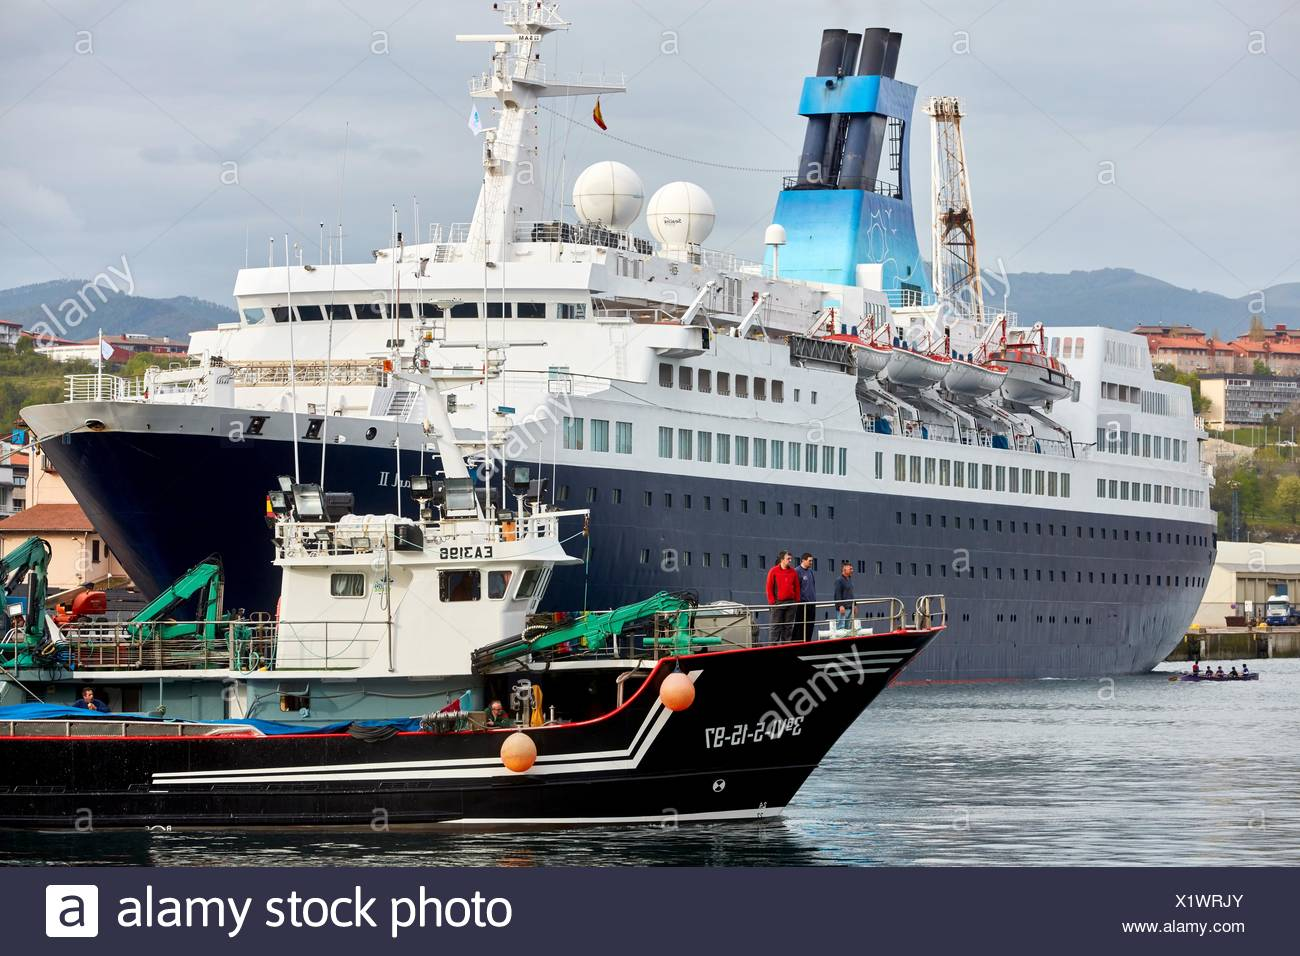 Cruise liner. Passenger ship. Pasaia Port. Gipuzkoa. Basque Country. Spain. Europe. - Stock Image